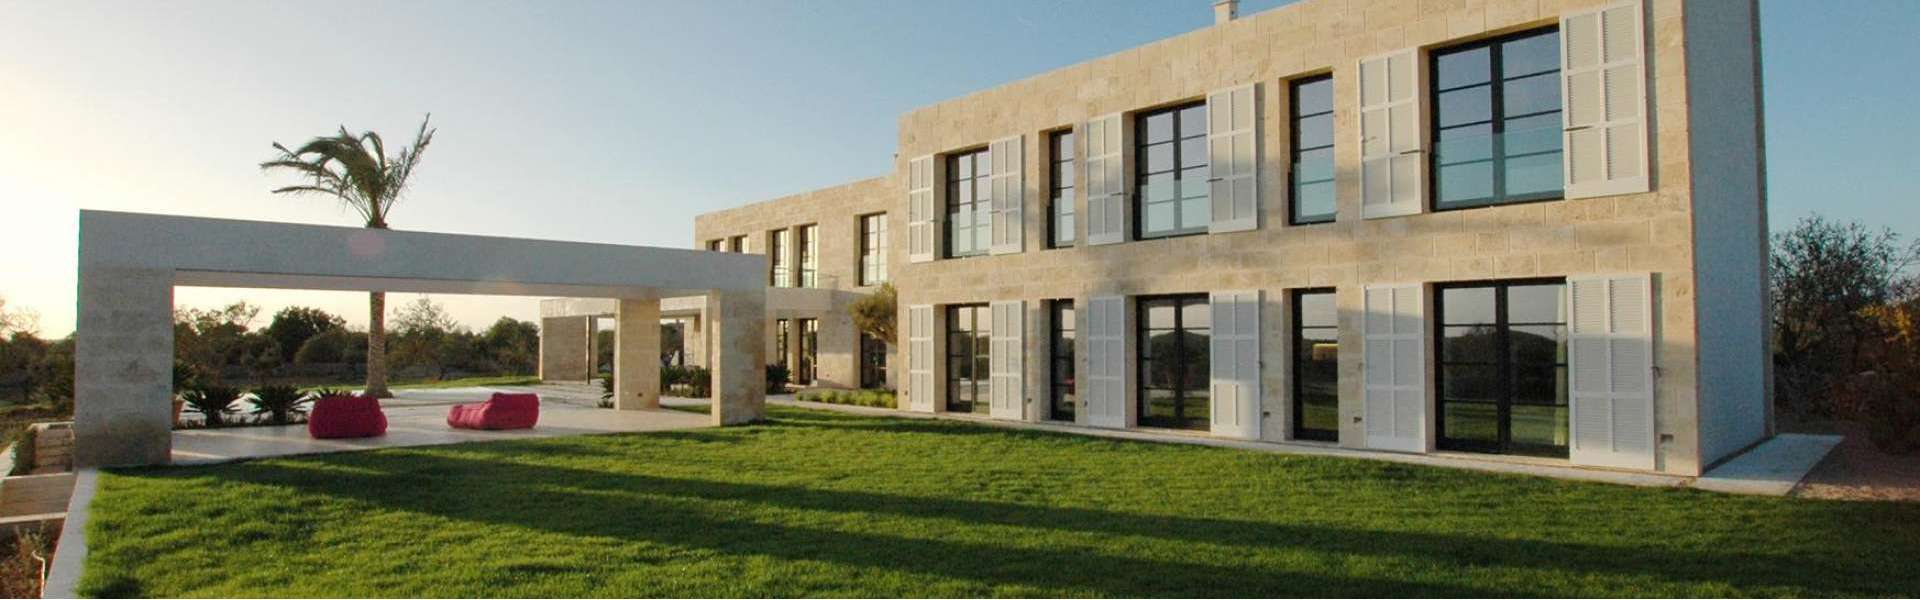 Exceptional new construction finca at Cala Llombards